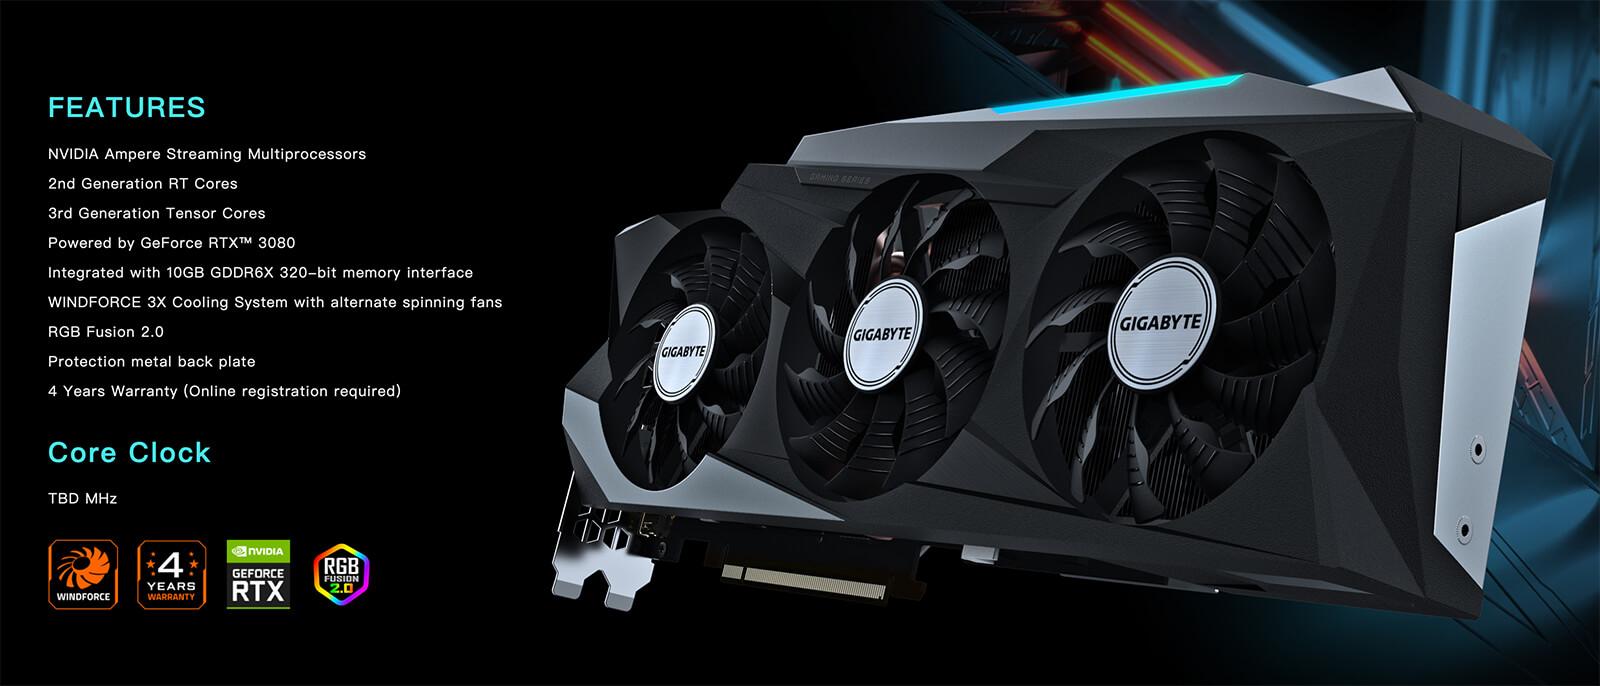 GIGABYTE GeForce® RTX 3080 Gaming OC 10GB - Tân Doanh